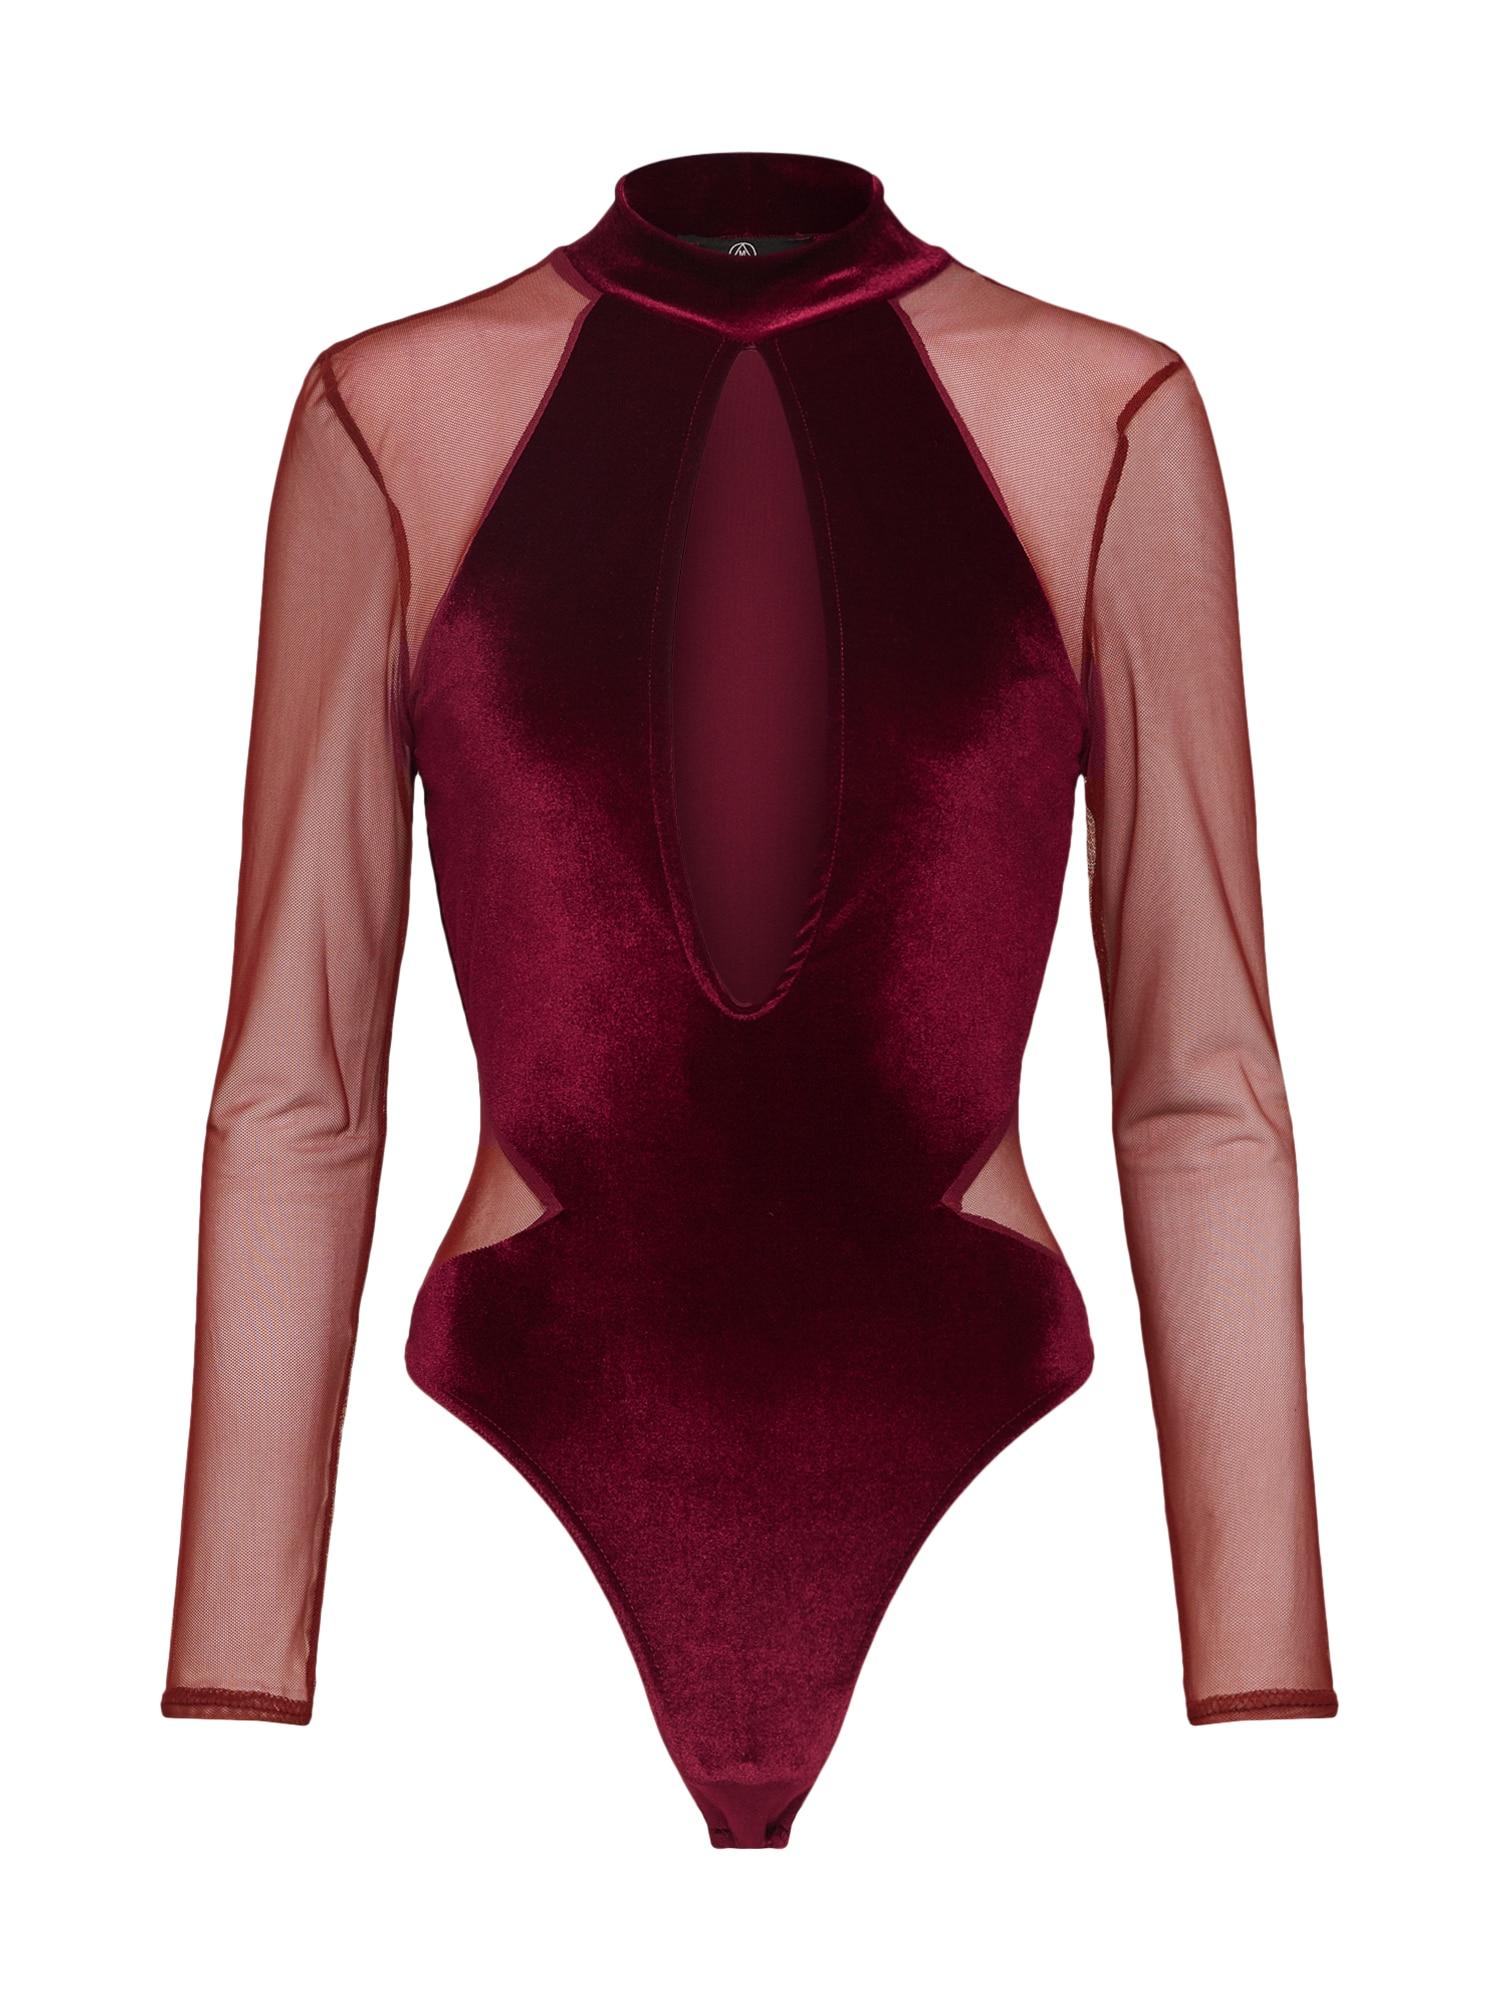 Tričko Velvet Bodysuit Lace Sleeves burgundská červeň Missguided